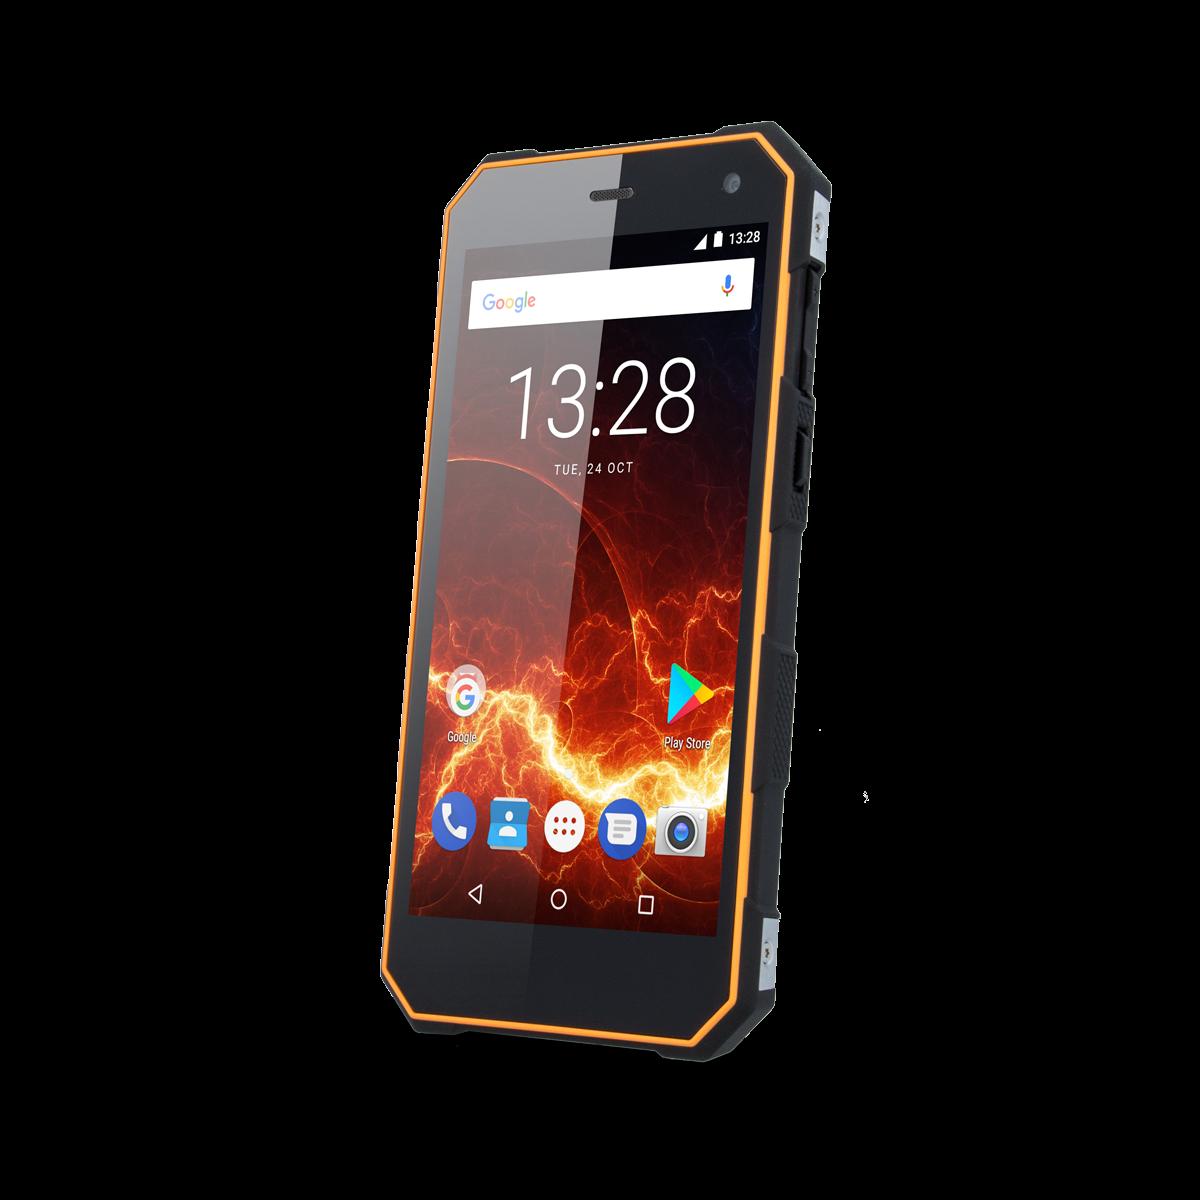 TELEFON DUAL SIM myPhone HAMMER ENERGY 3G ORANŽOVO-ČERNÝ